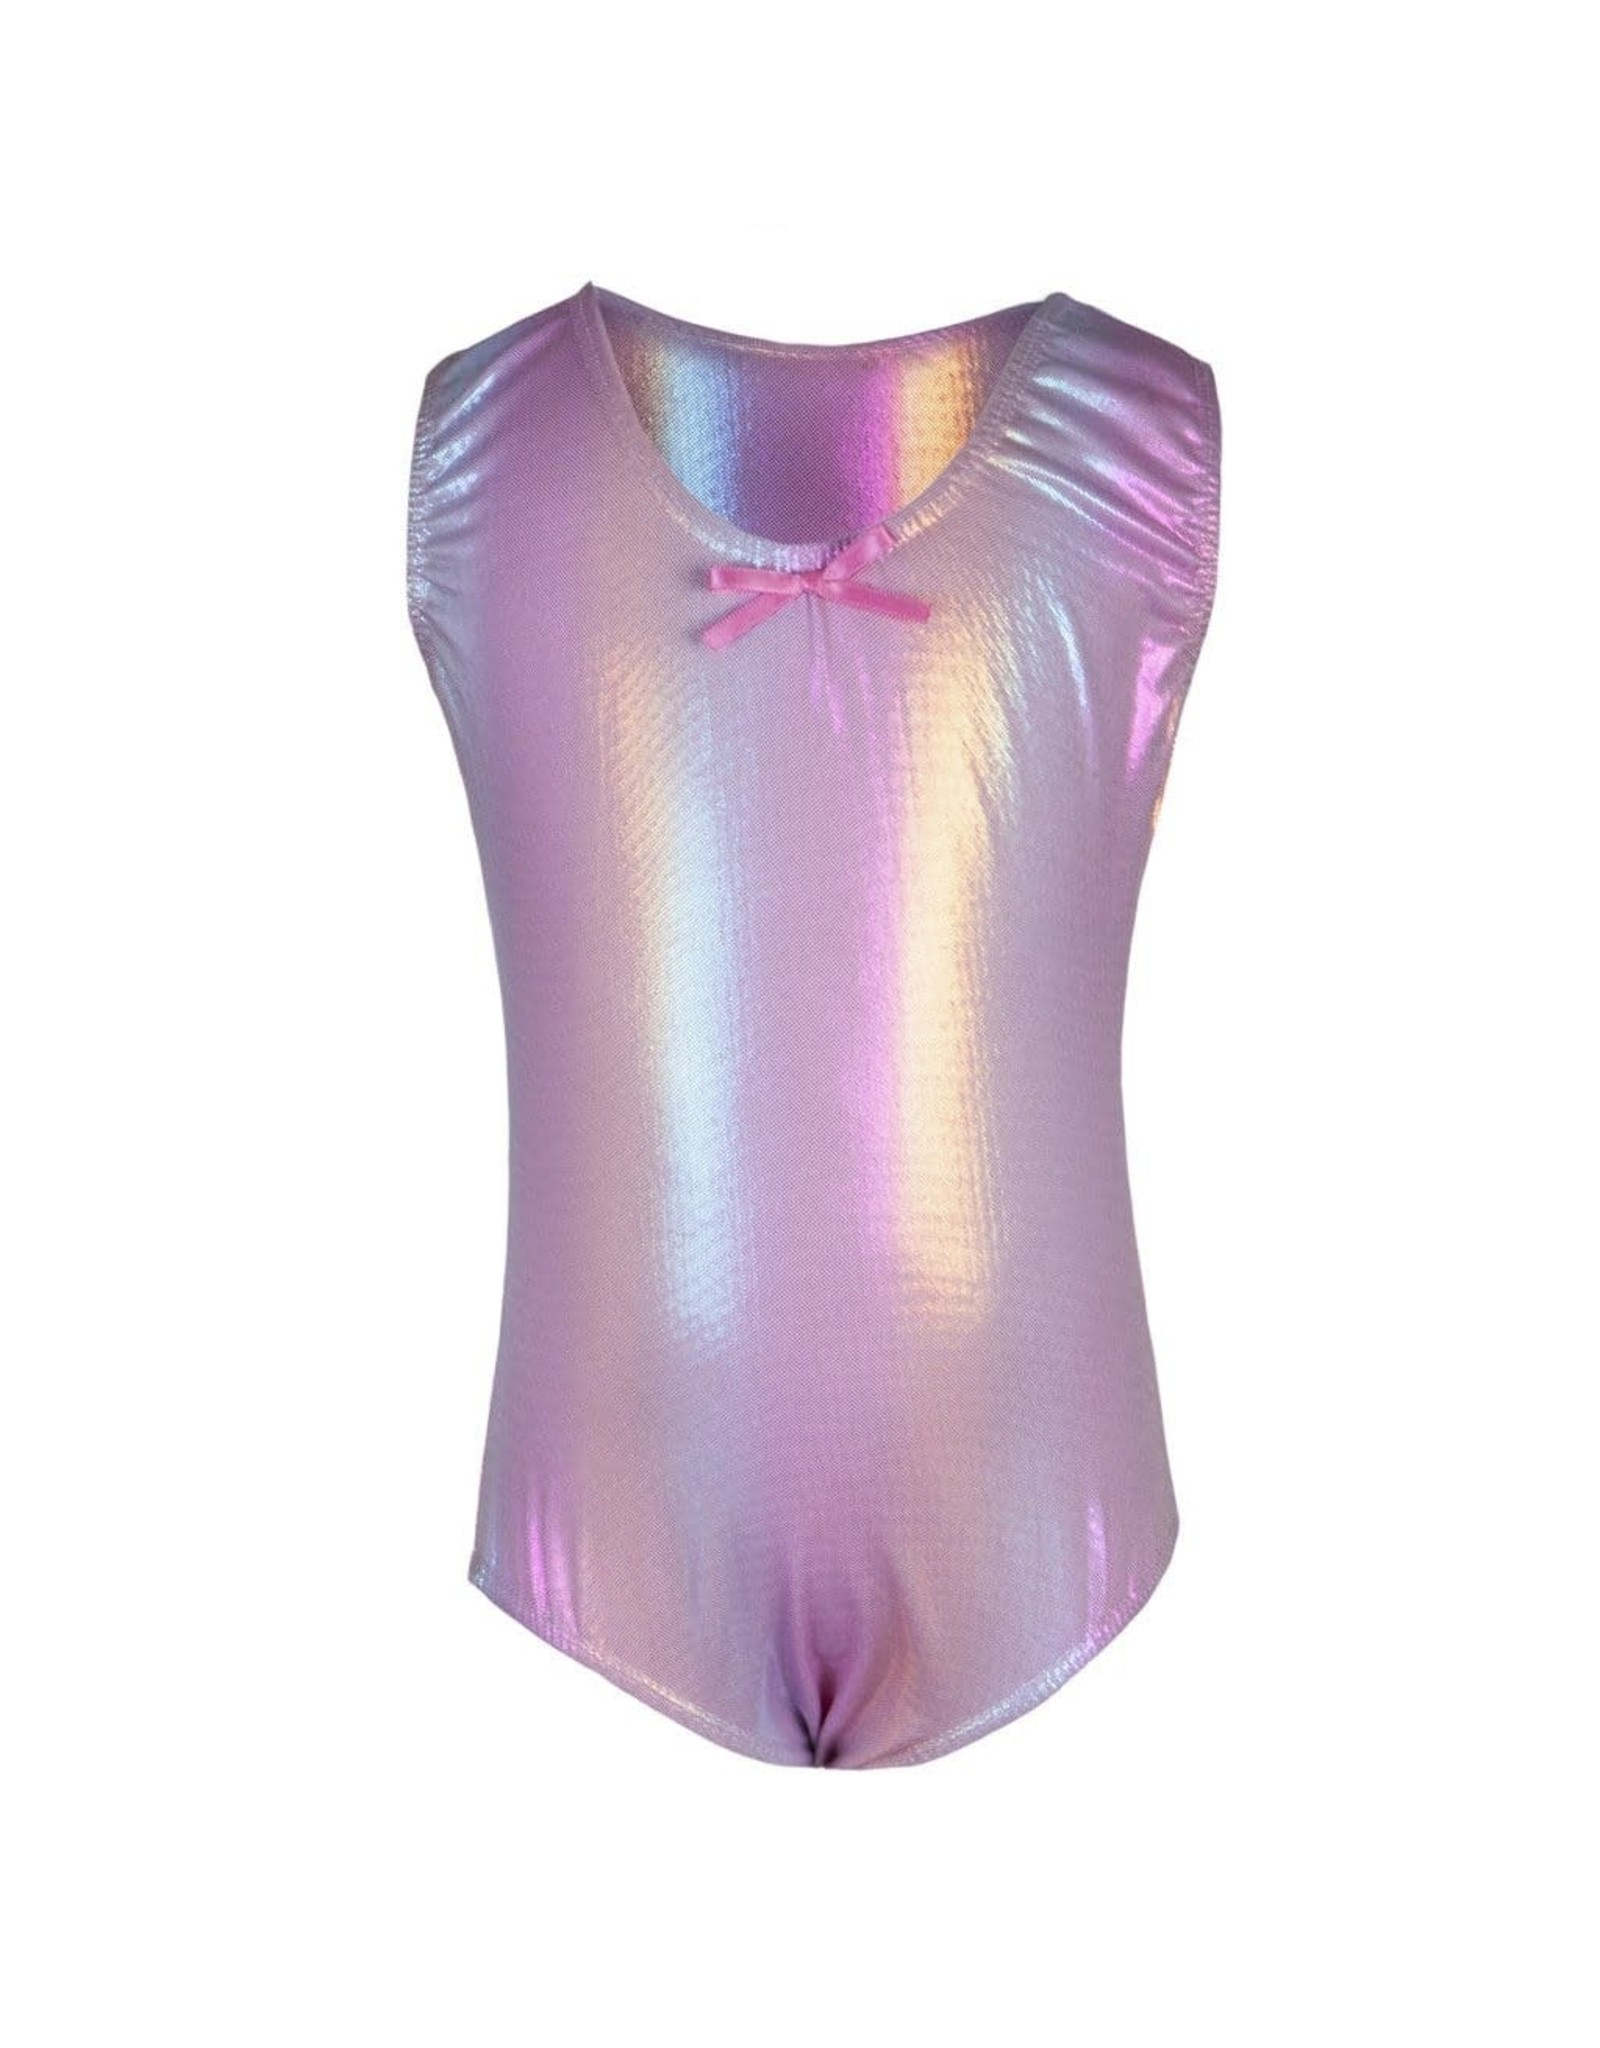 Great Pretenders Bodysuit Rainbow Pink, Size 5-6